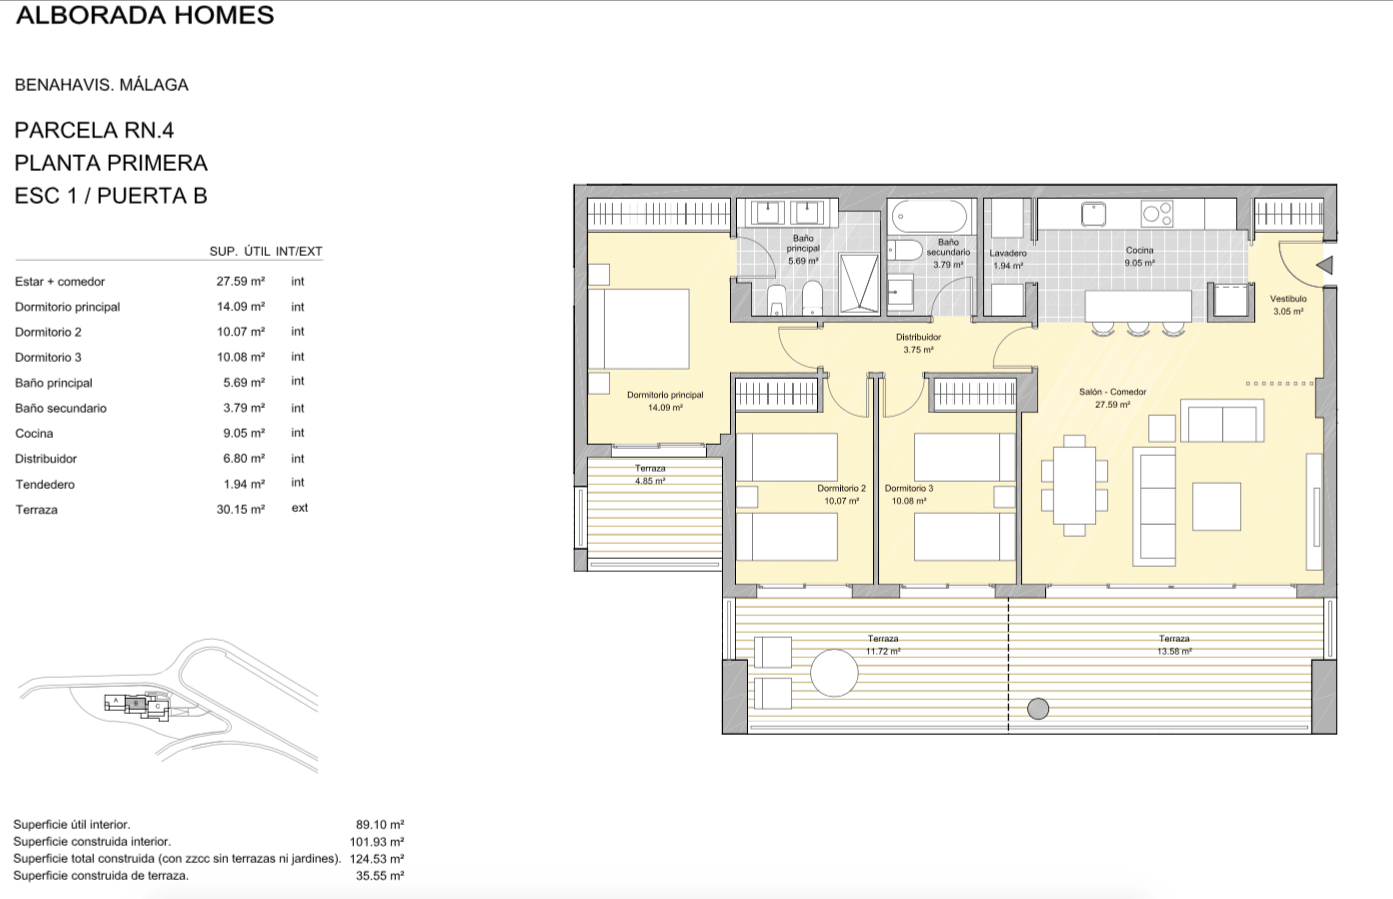 alborada homes benahavis golf la quinta moderne appartementen penthouses te koop grondplan RN4 11B verdieping 3bed